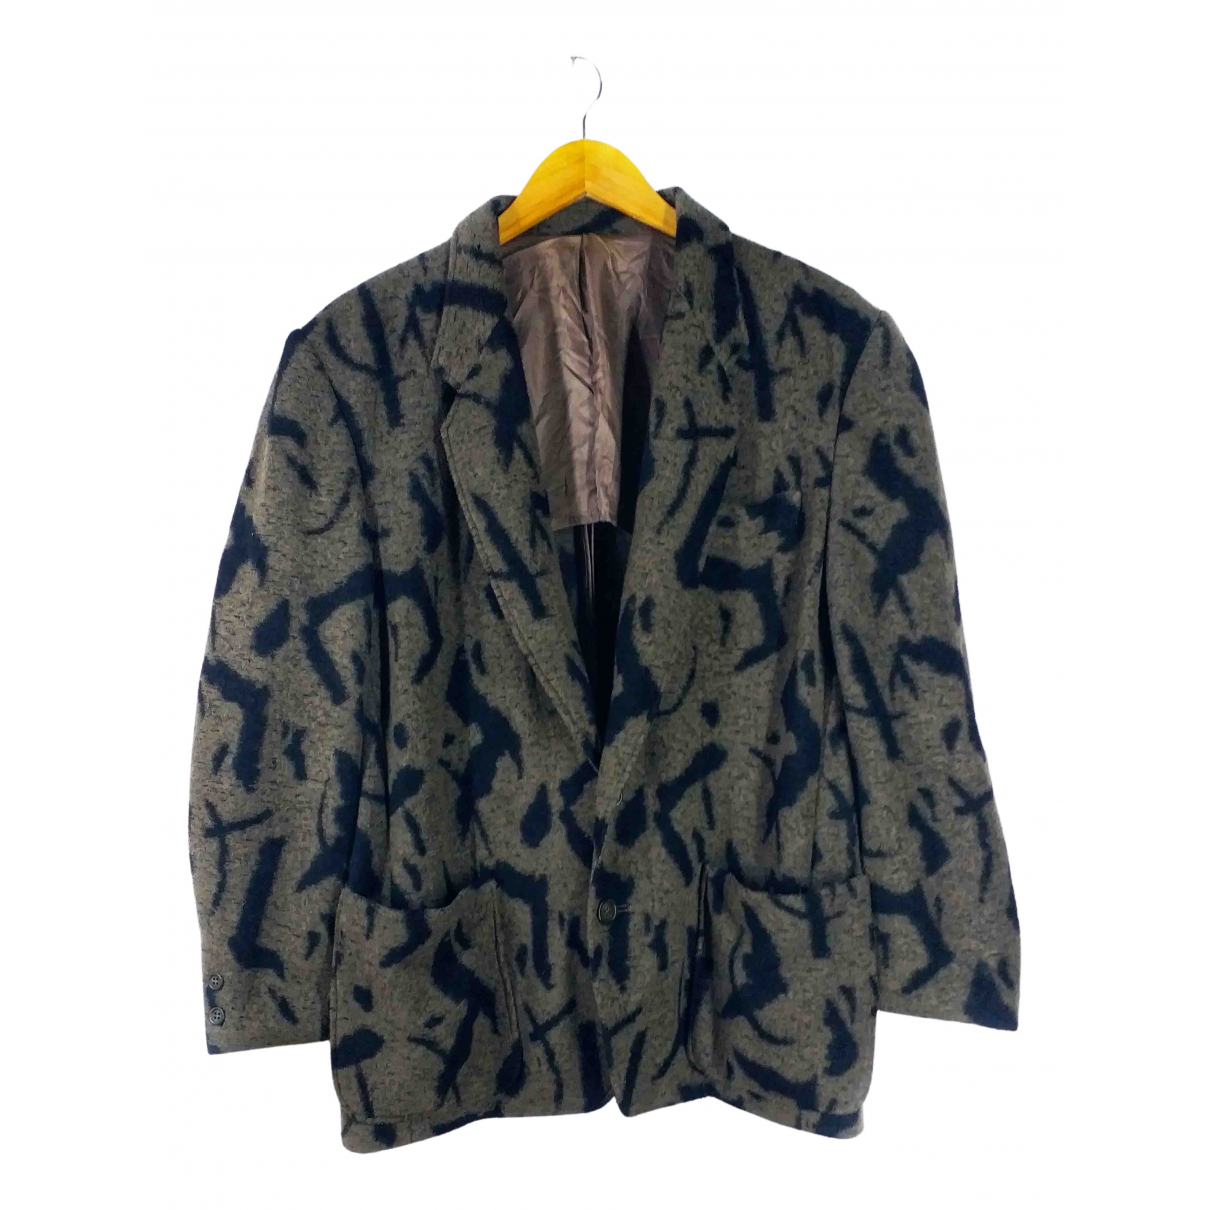 Issey Miyake - Manteau   pour homme en laine - marron